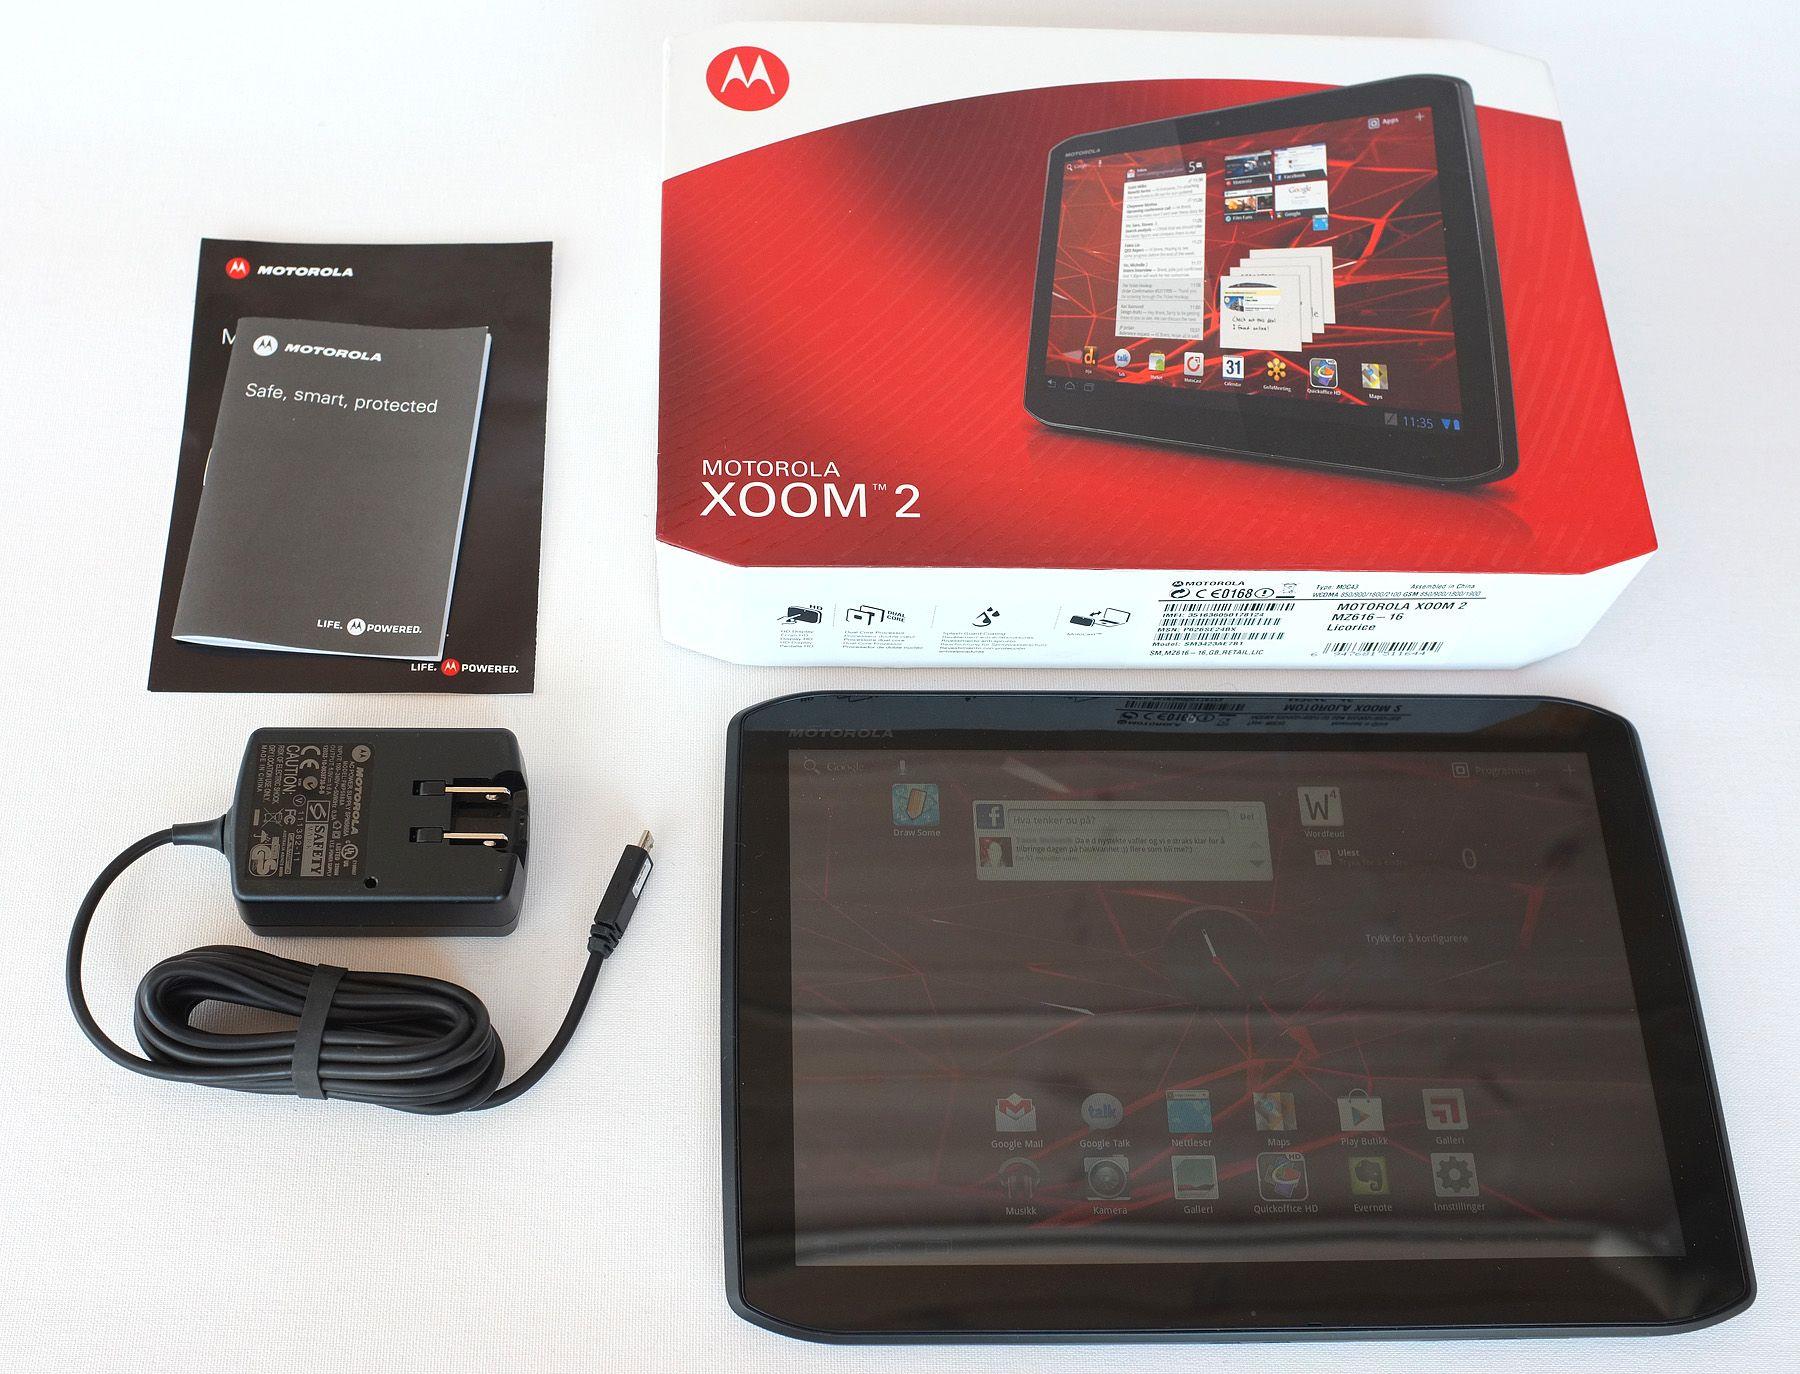 Motorola Xoom 2 salgspakke.Foto: Audun M. Solheim